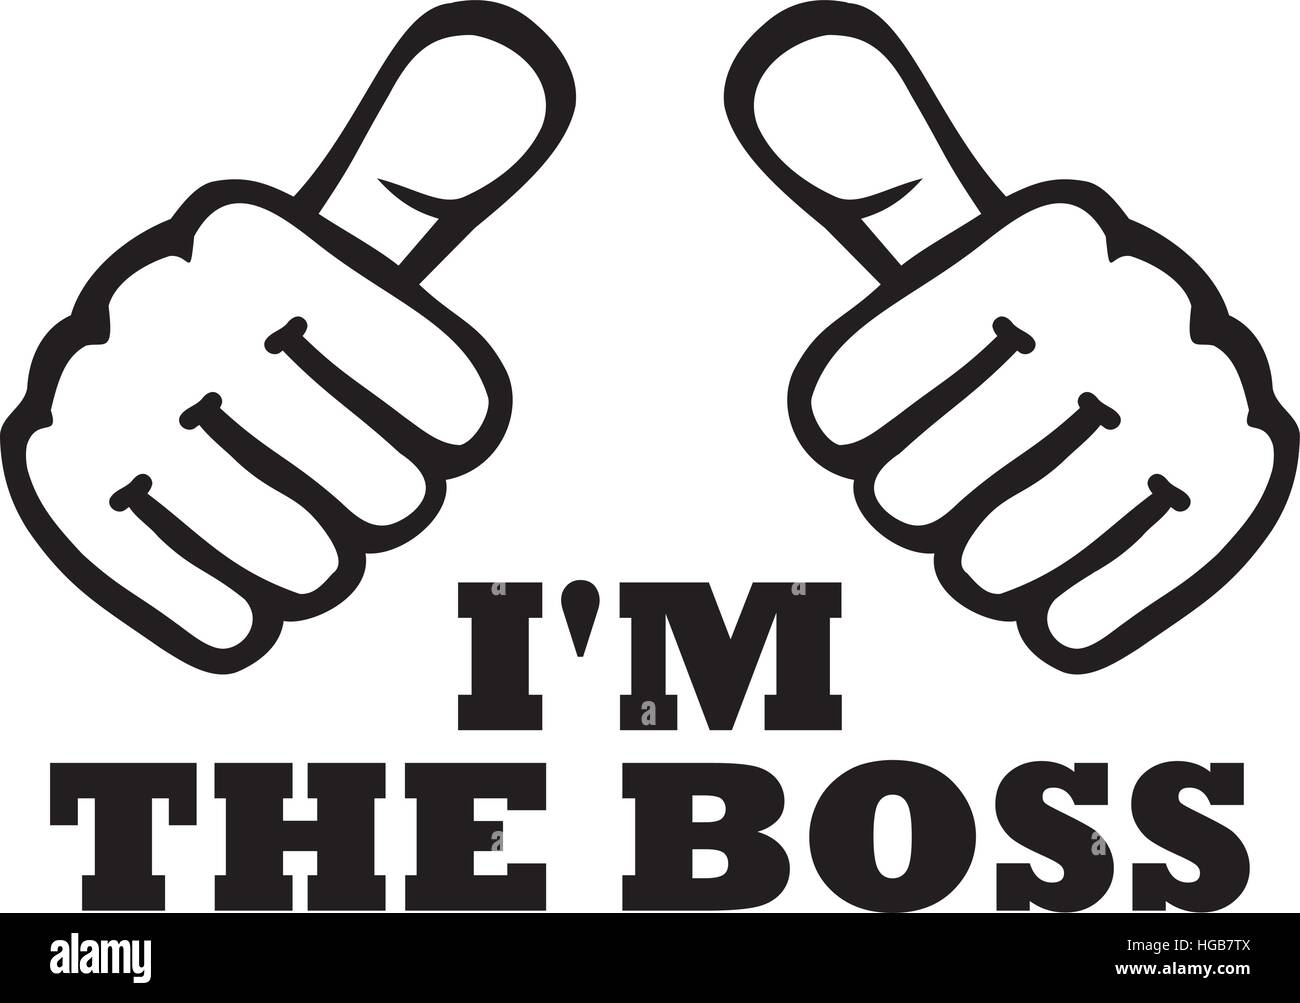 I'm the boss t